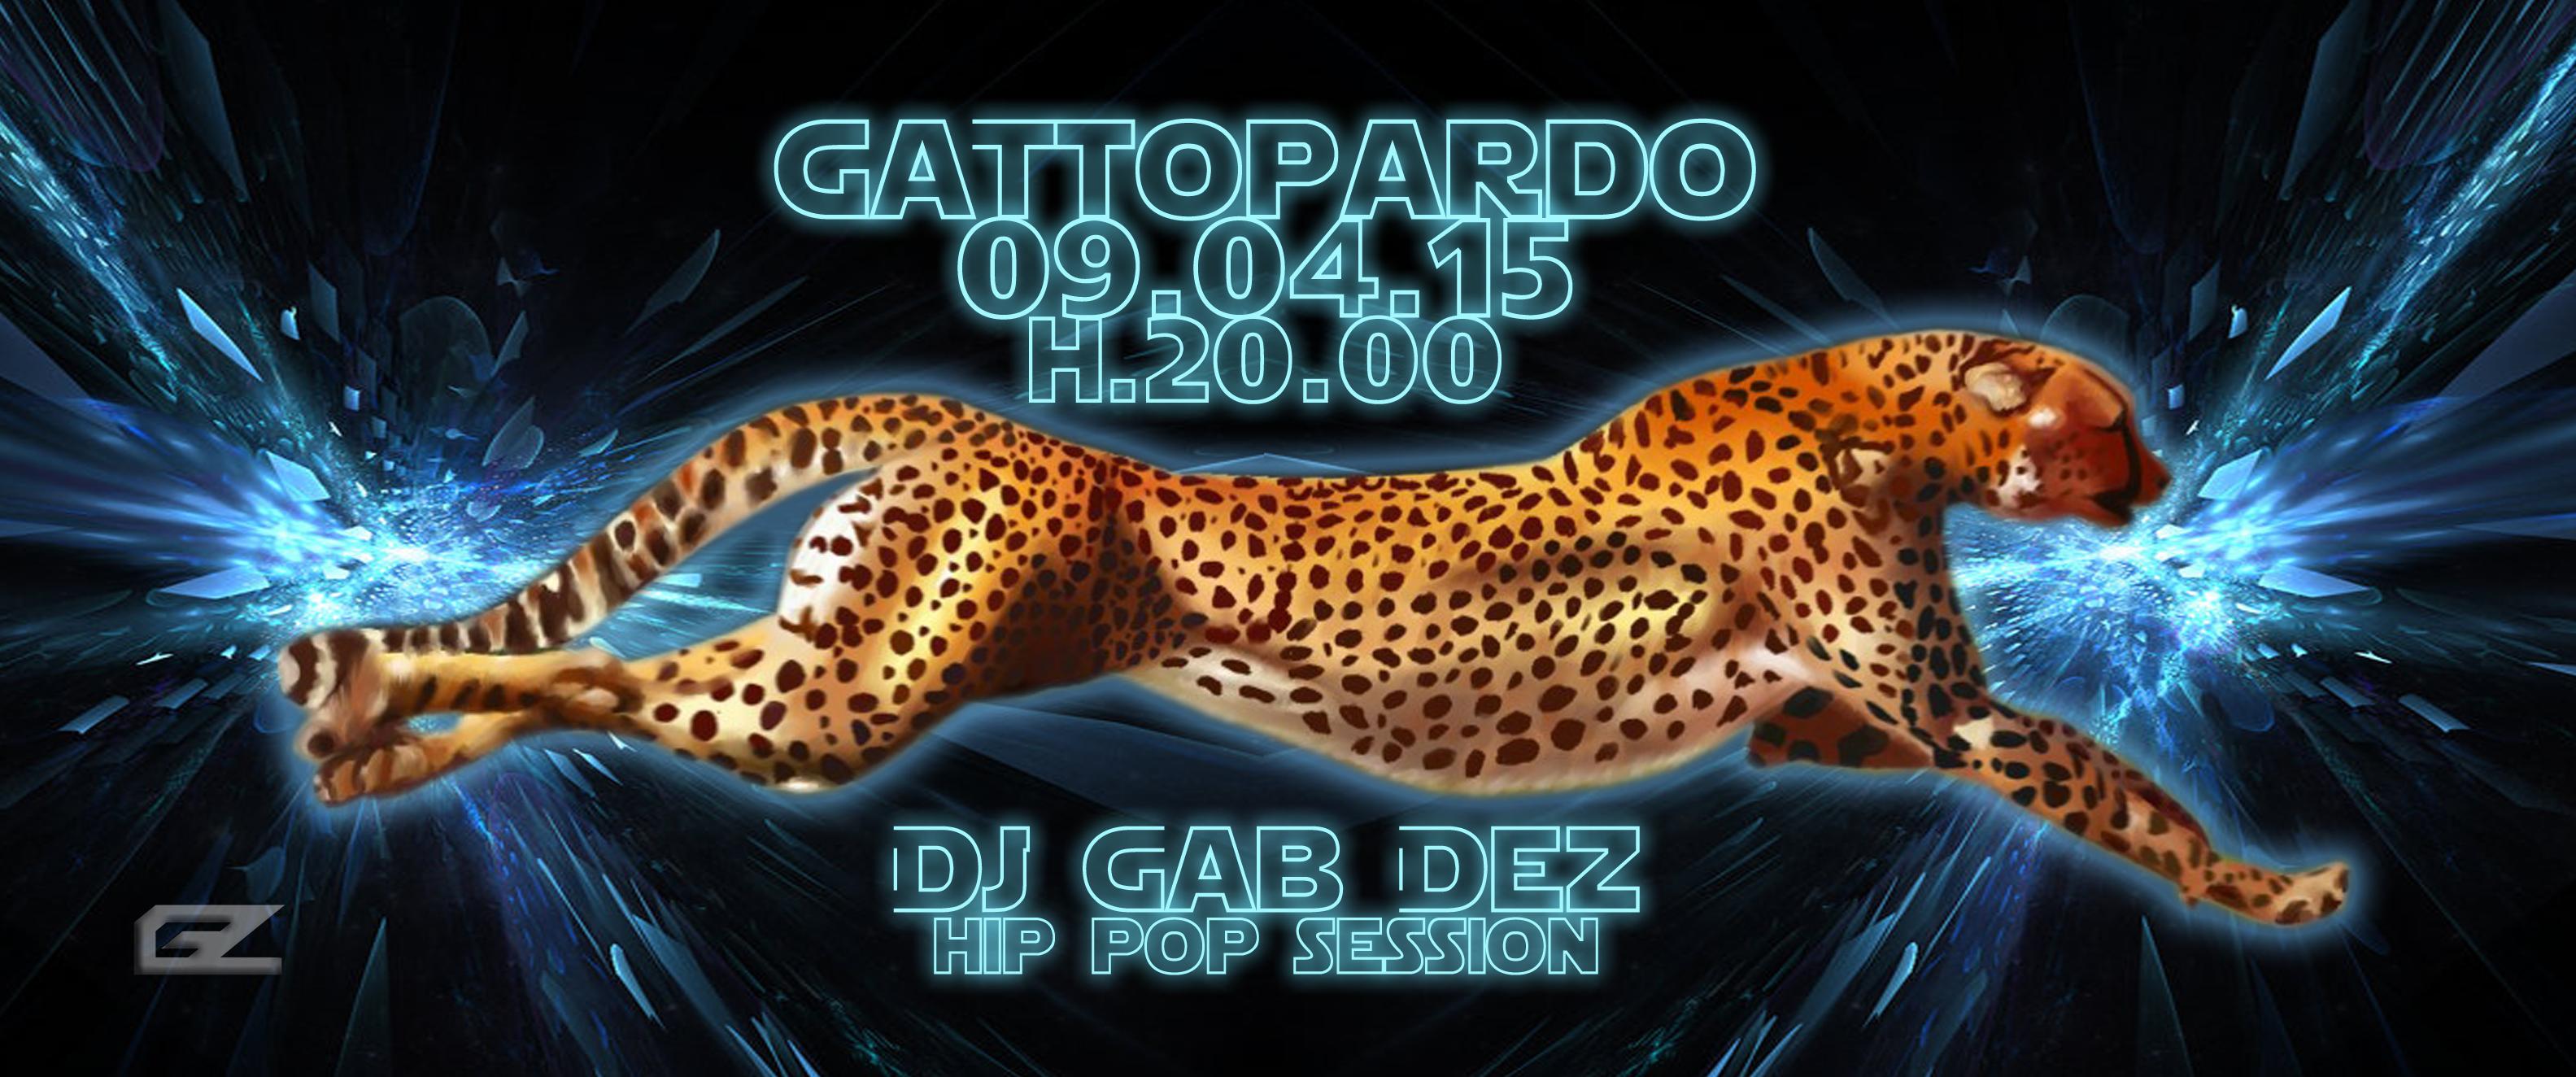 Gattopardo 09.04.15.jpg